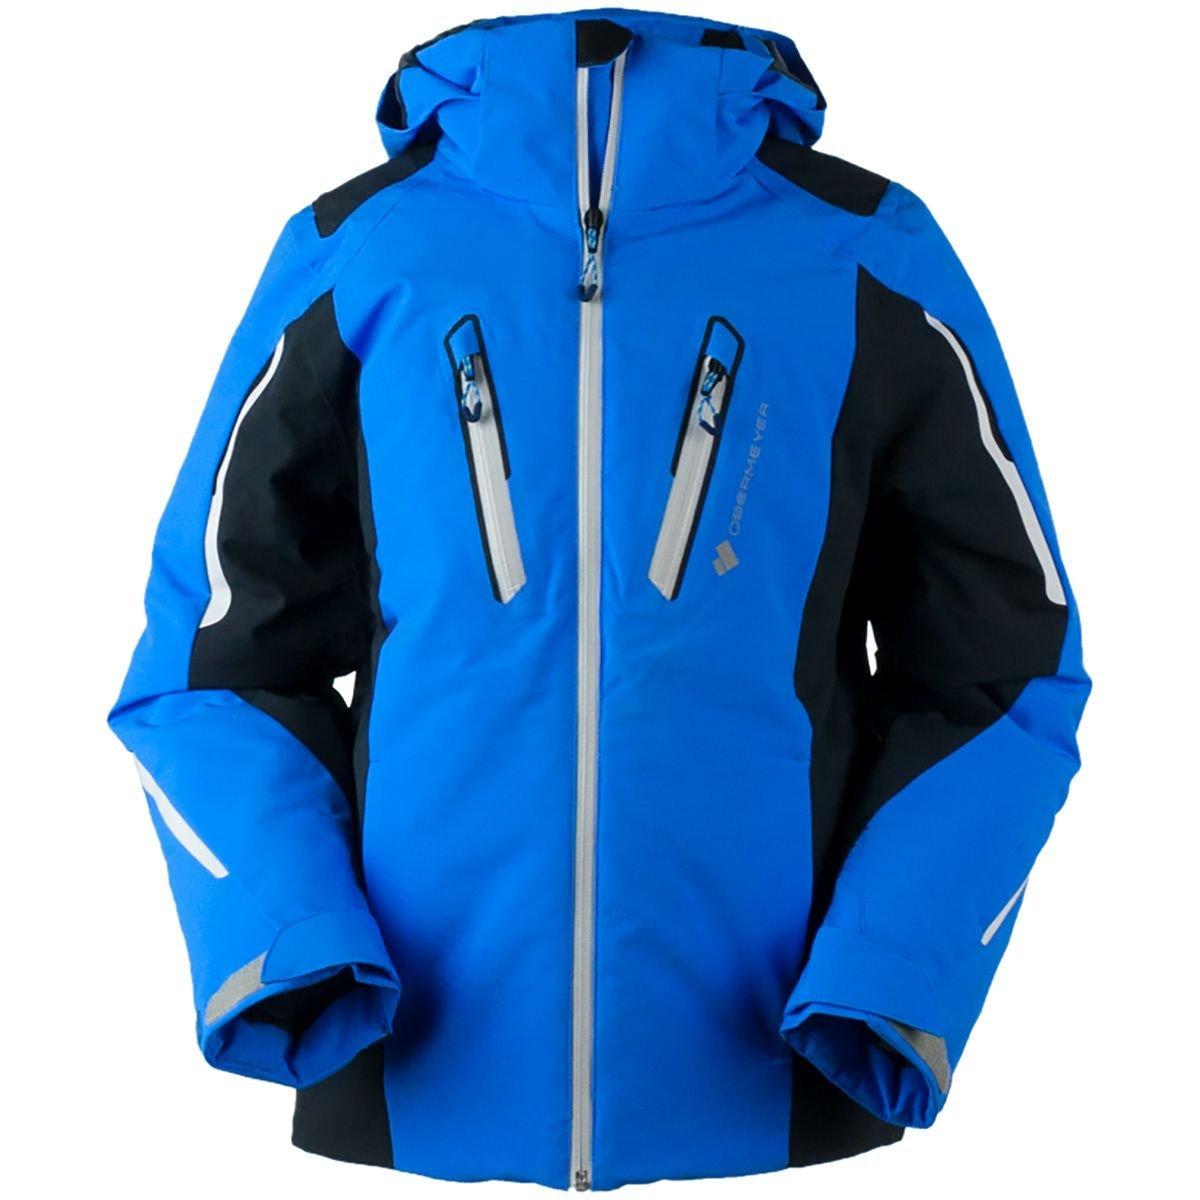 Obermeyer Kids Boy's Mach 8 Jacket (Little Kids/Big Kids) Stellar Blue X-Large by Obermeyer Kids